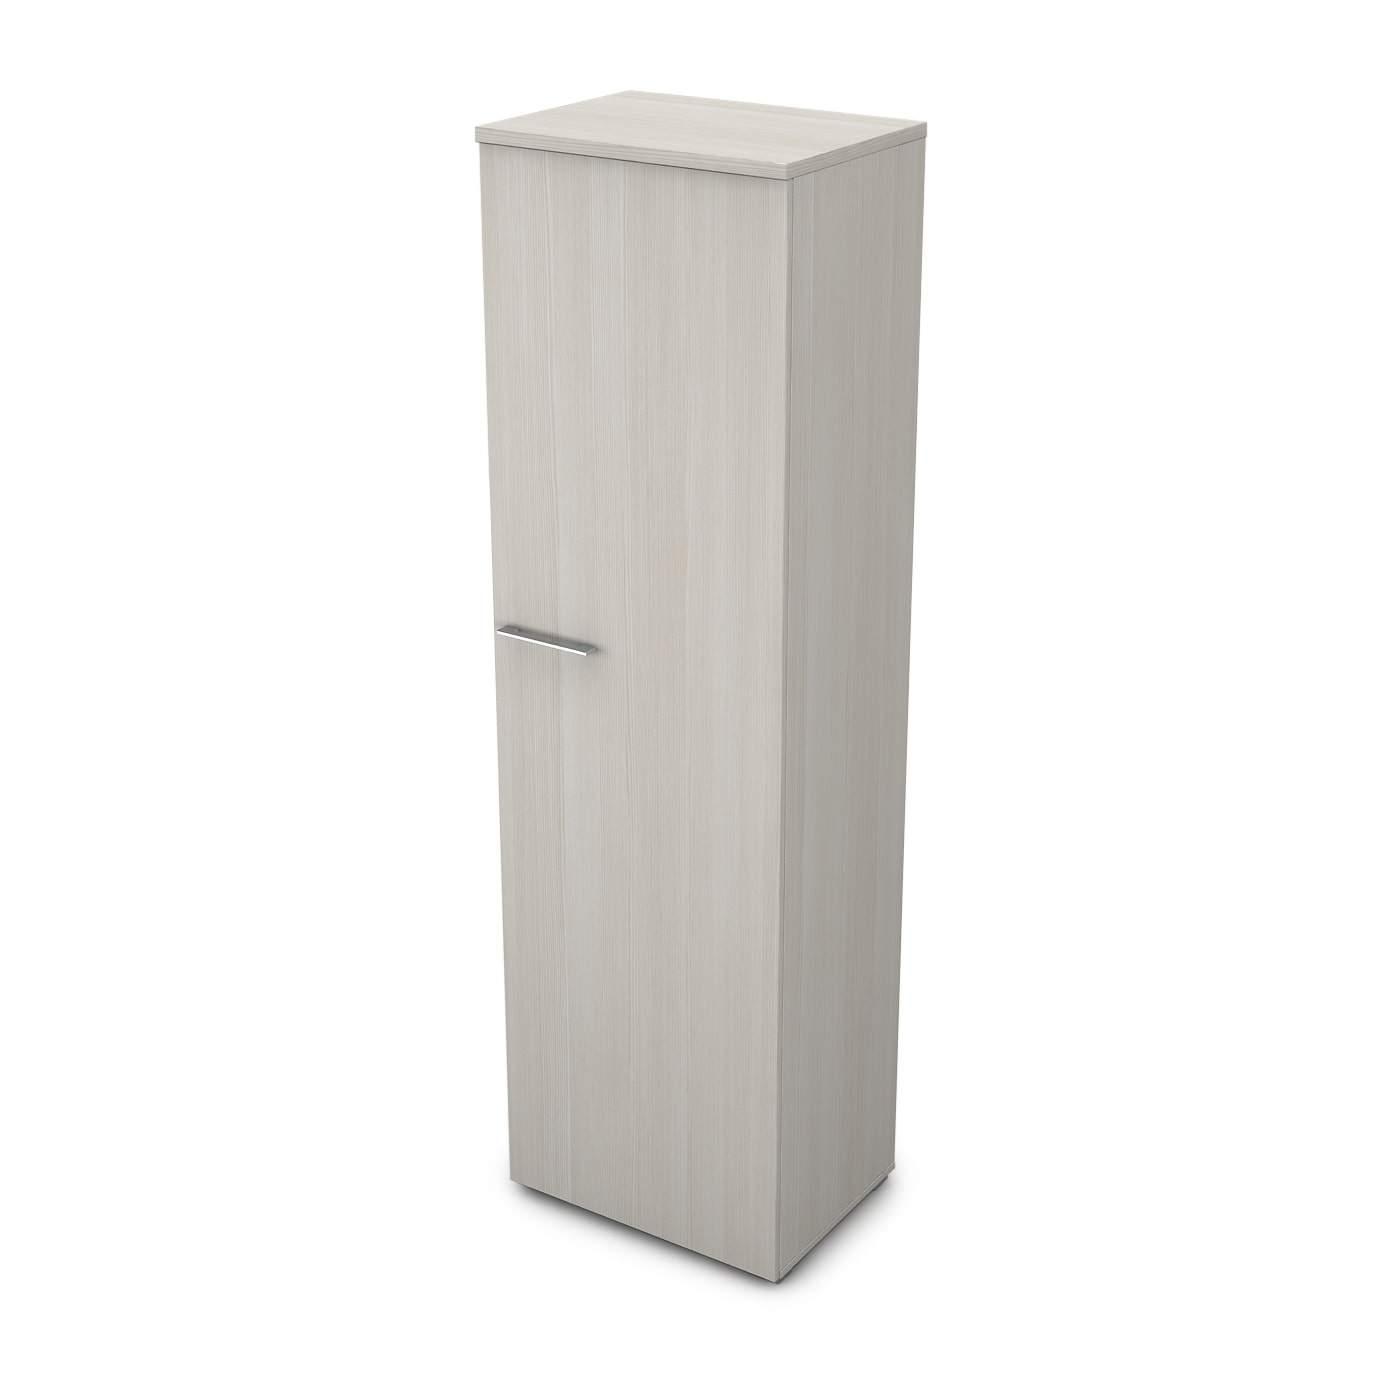 Шкаф для одежды 600x450x2045